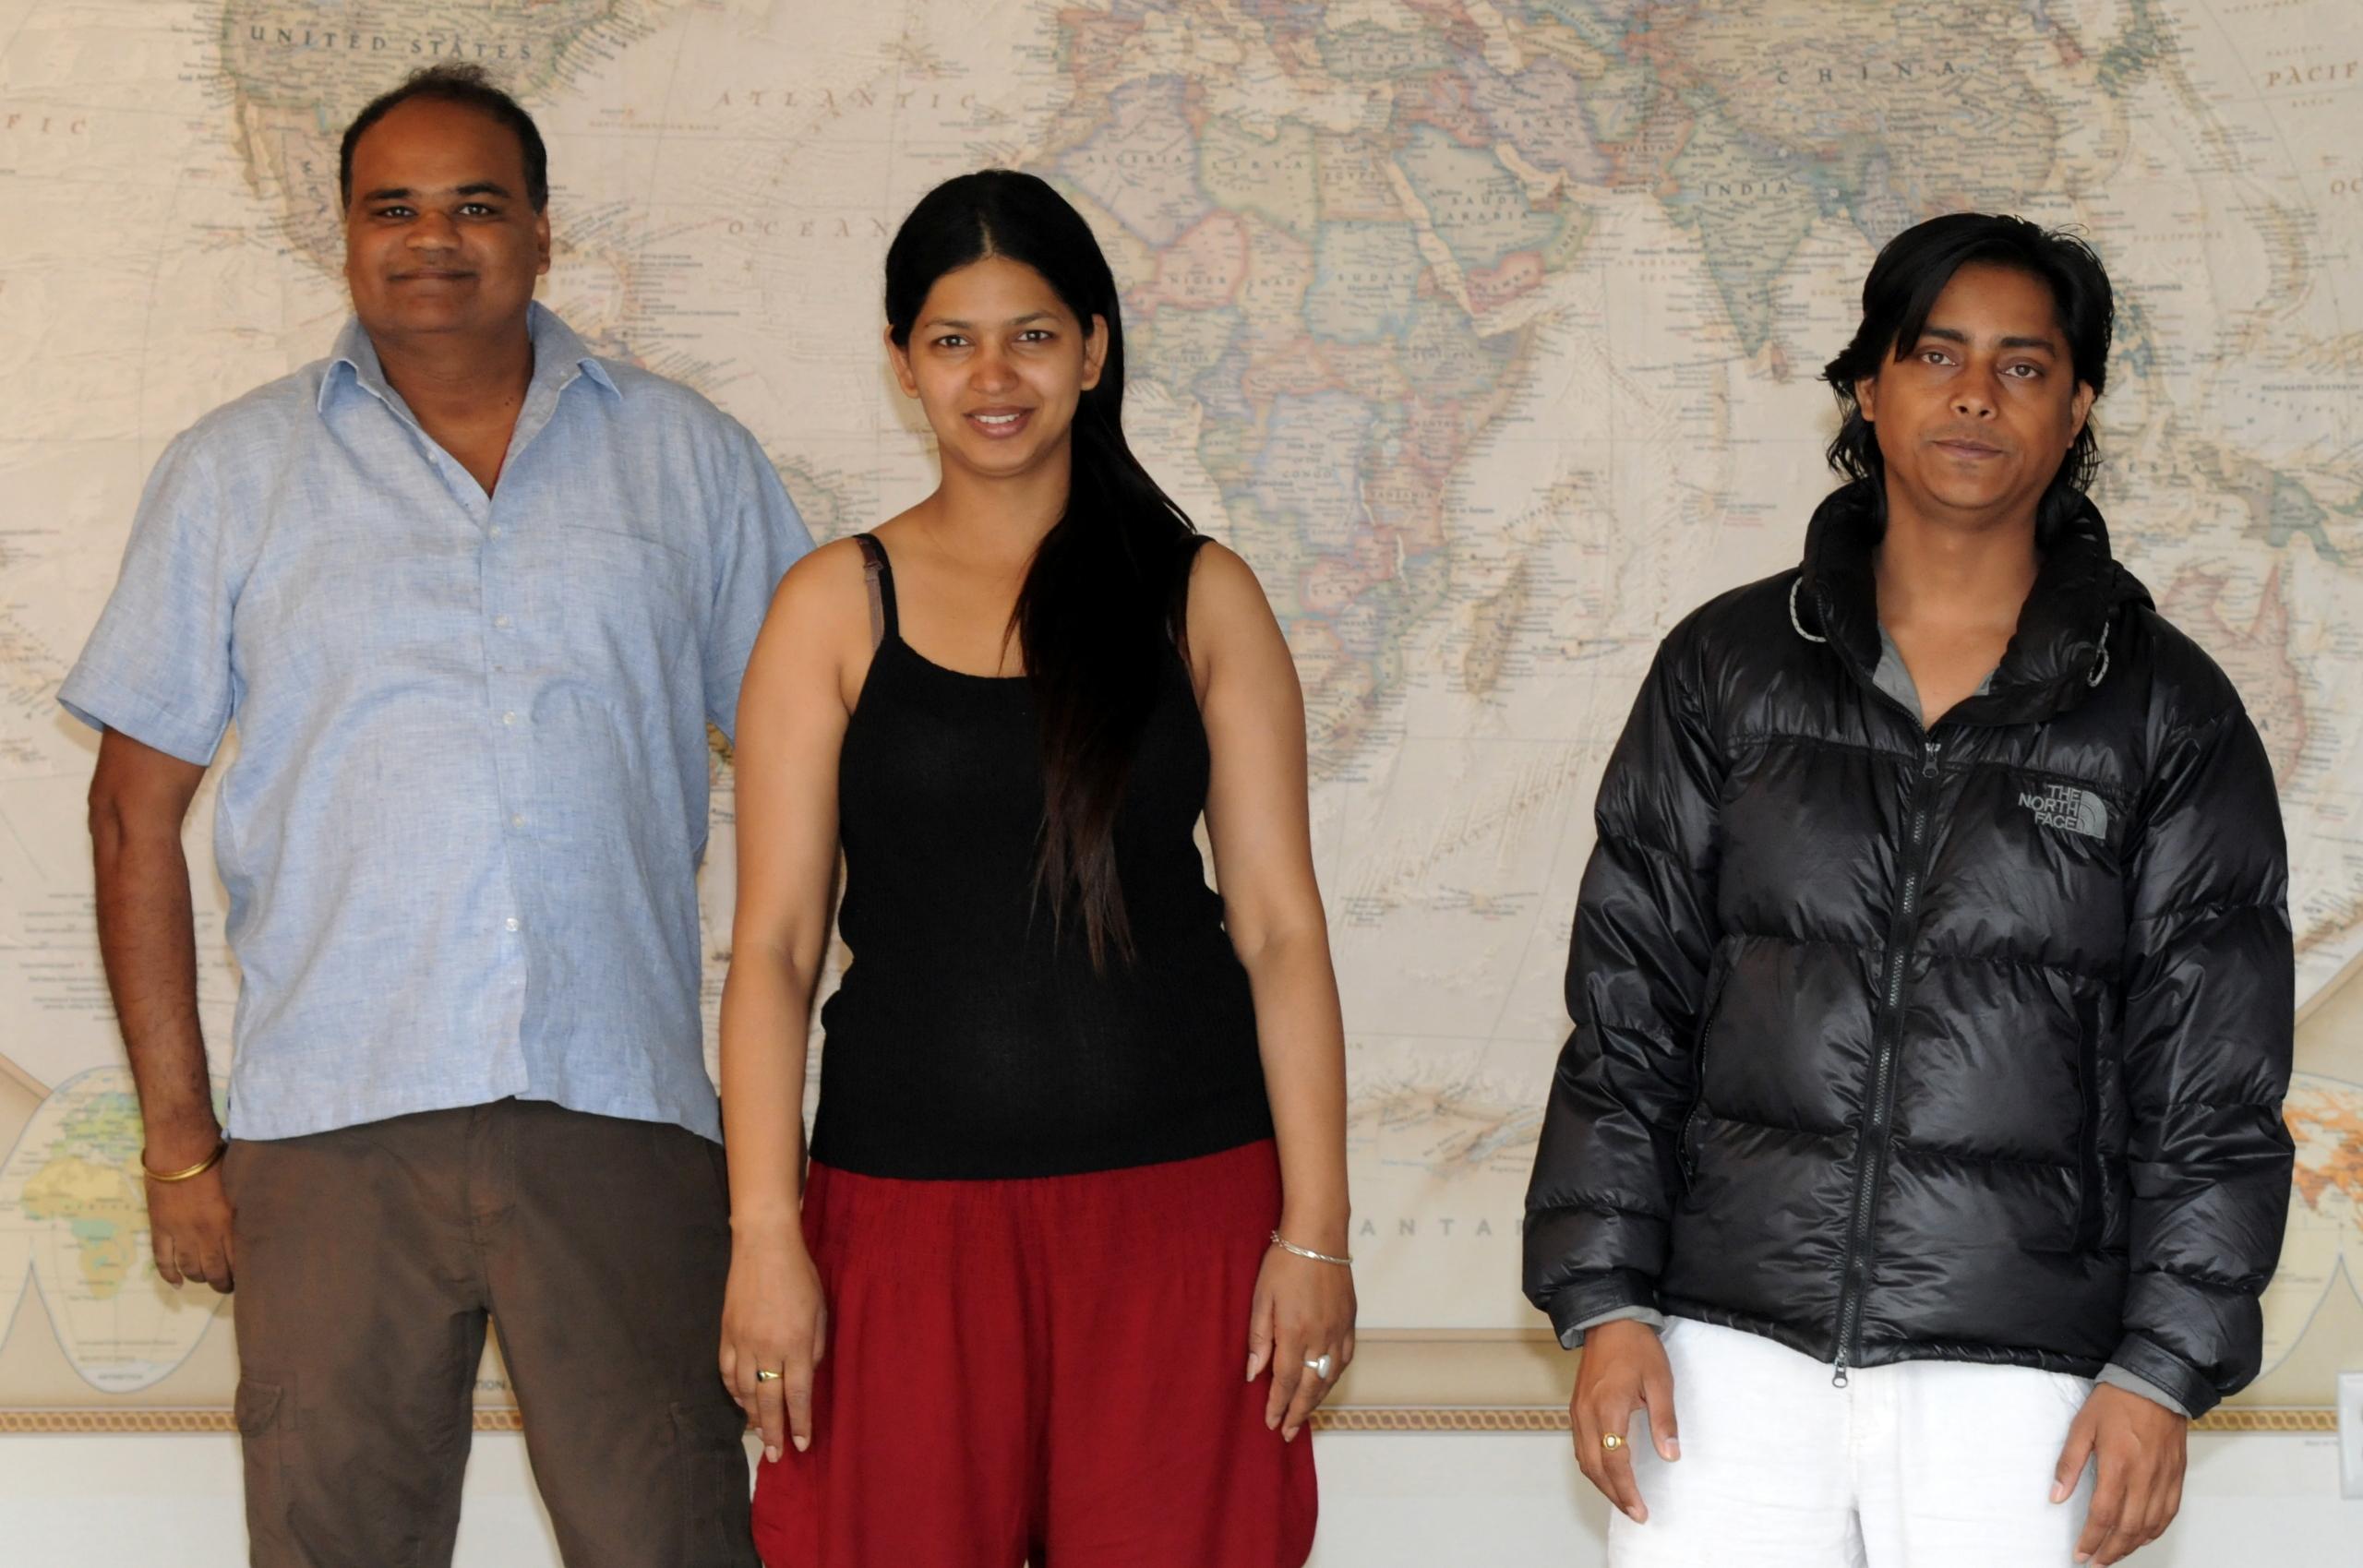 Kamal, Puja & Dharma from Nepal